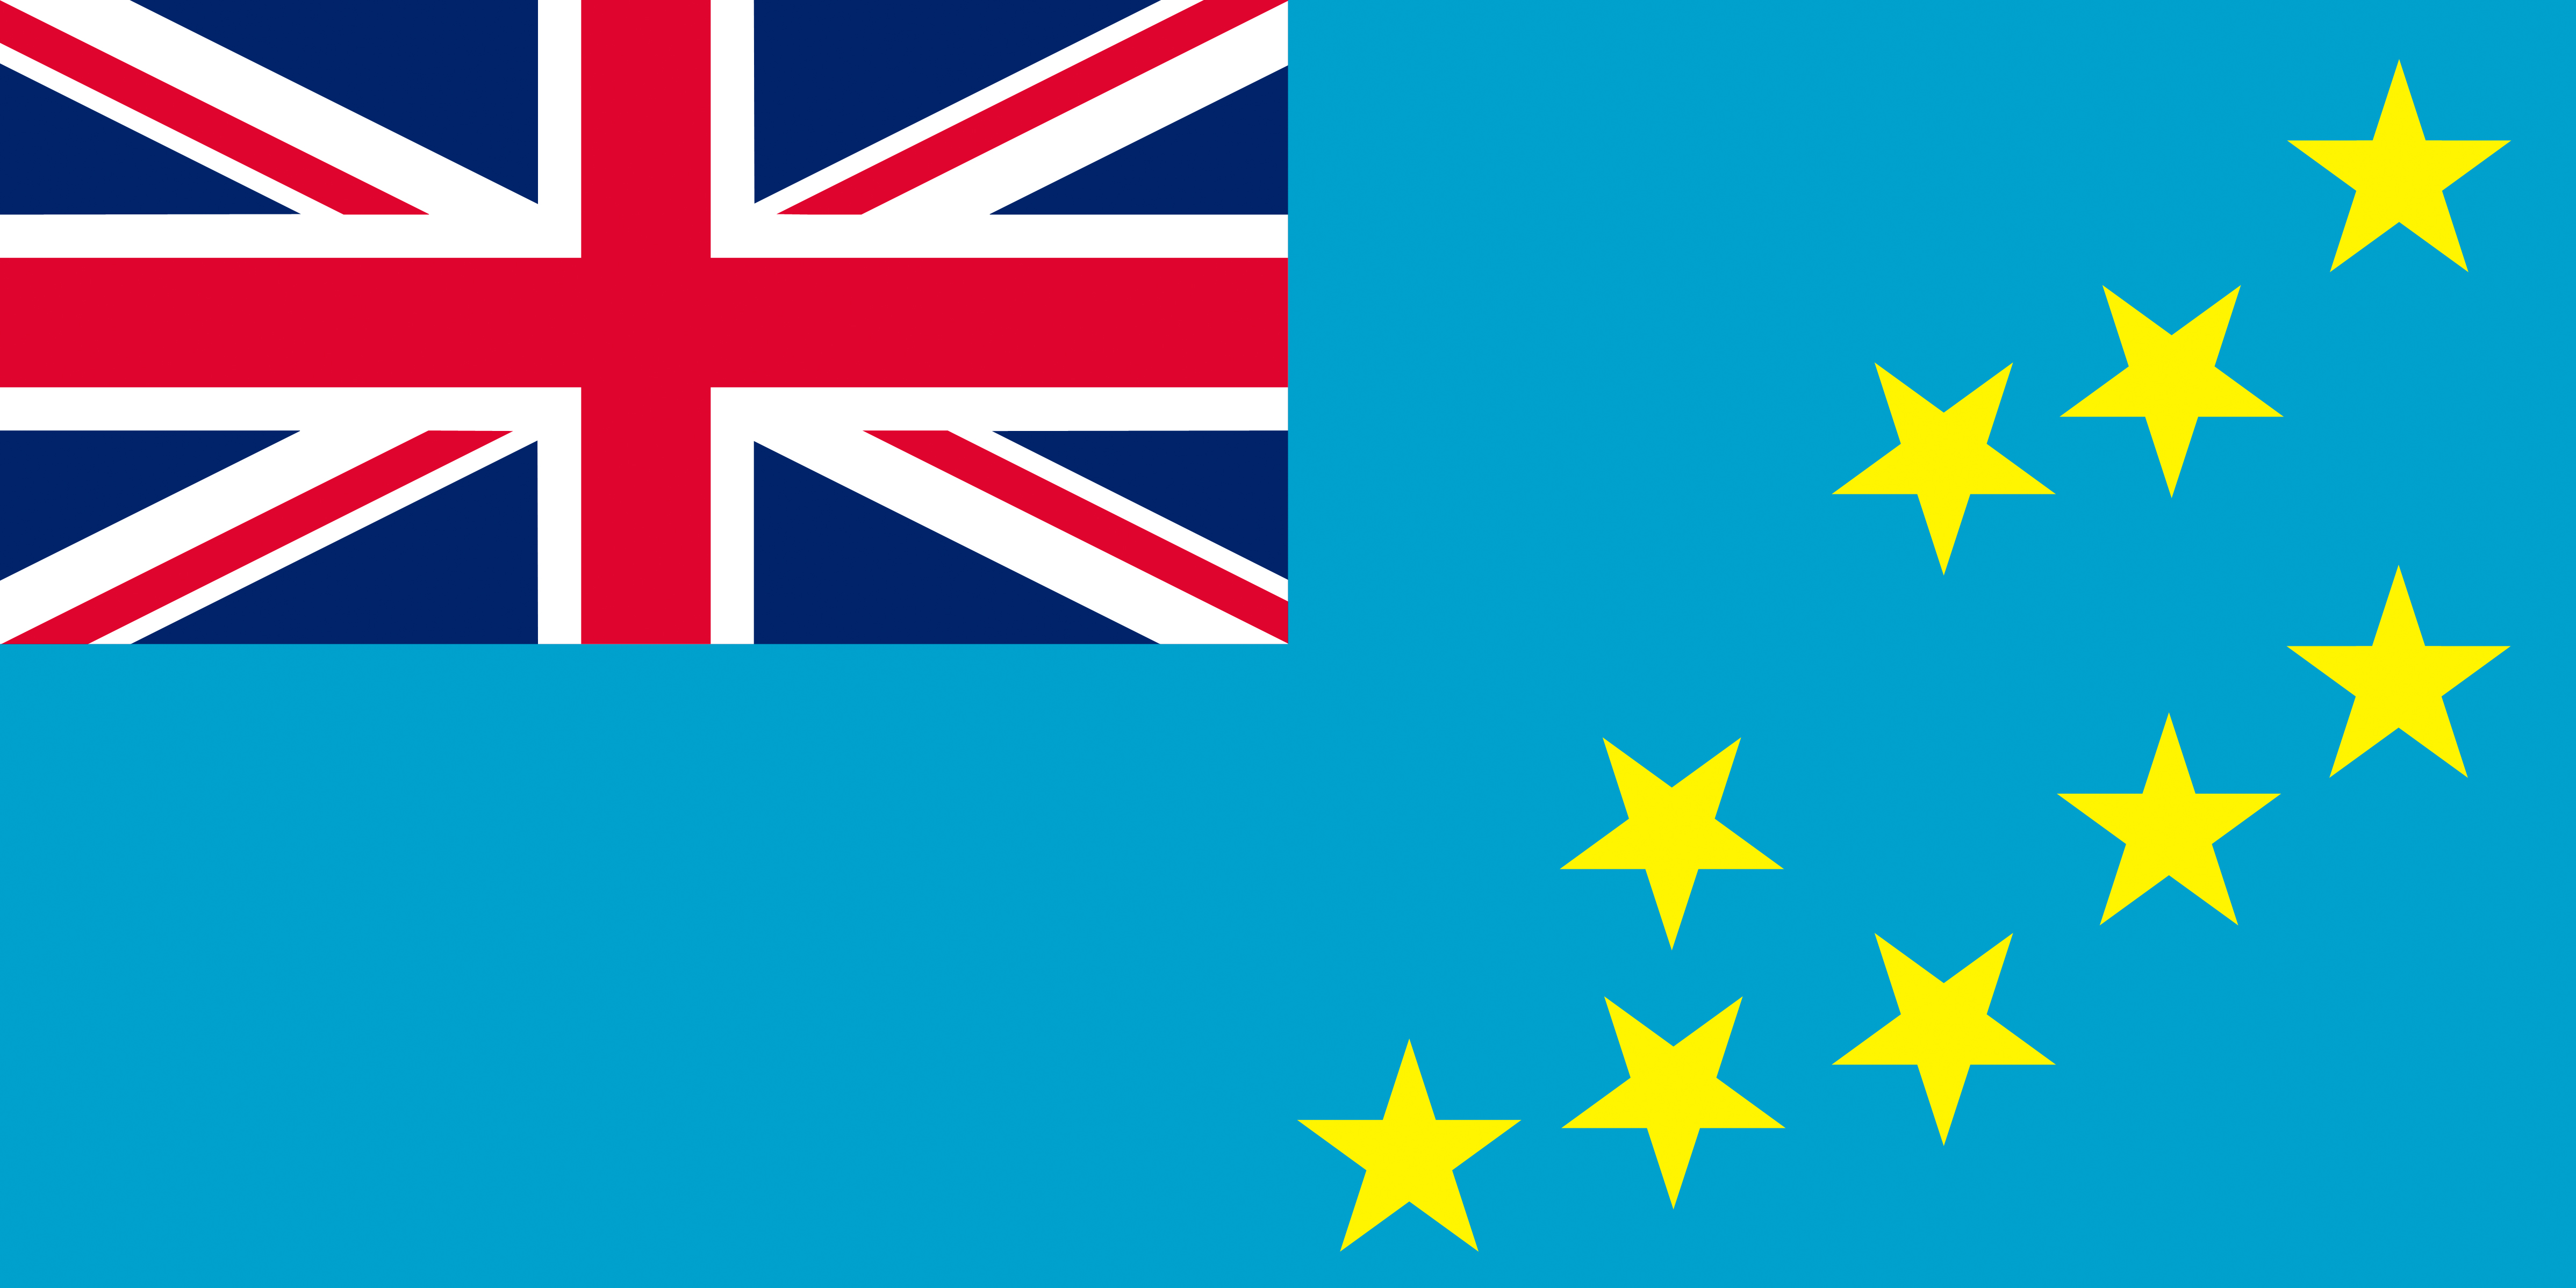 Wallpapers Tuvalu Flag 4793x2397 4793x2397